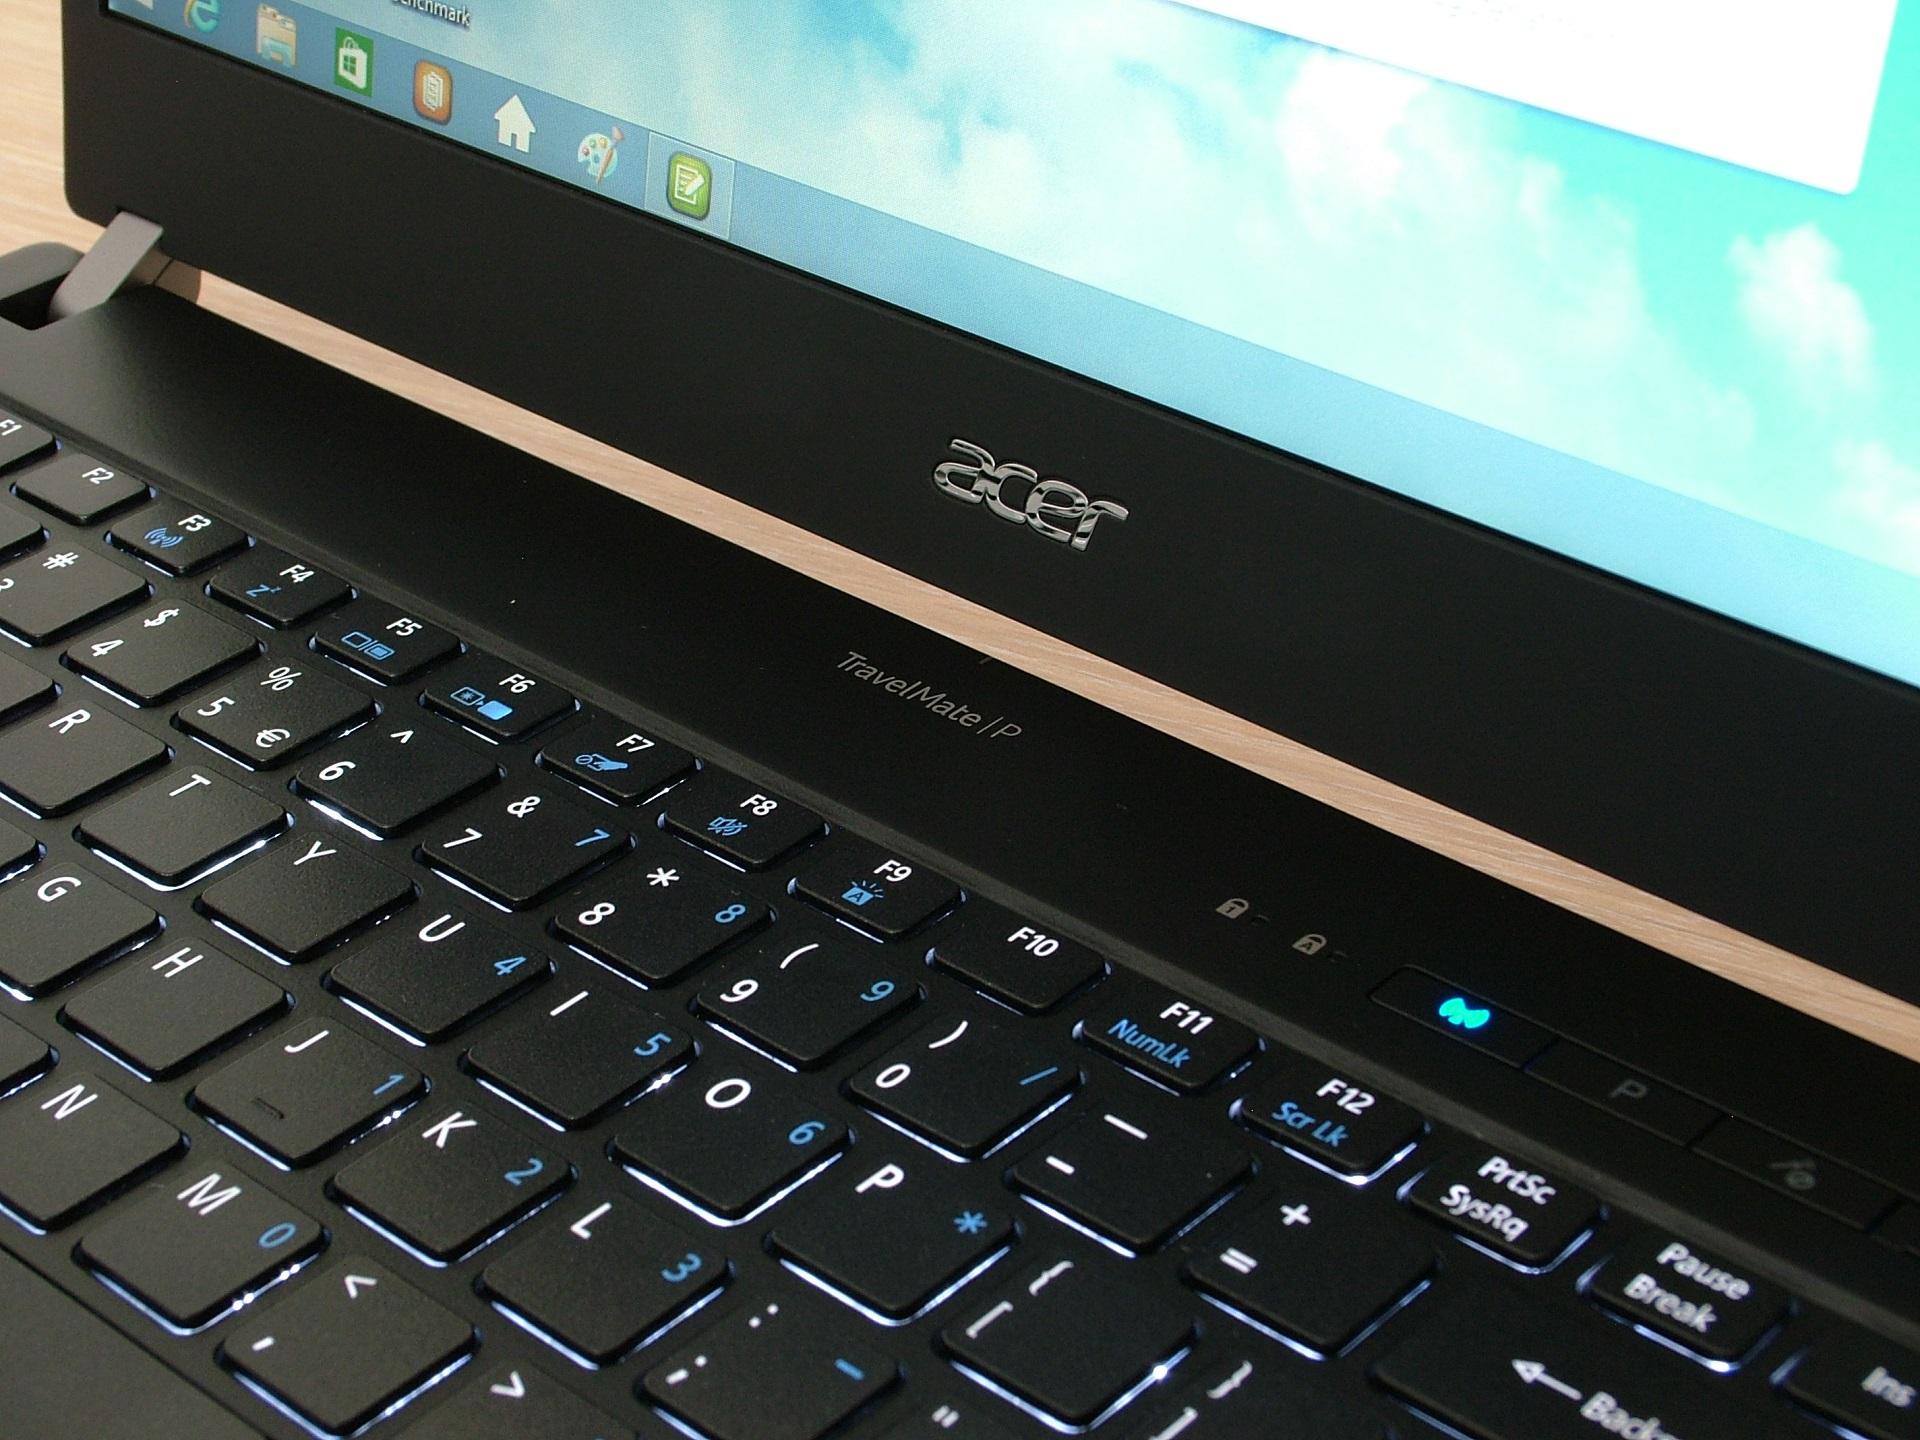 Acer Travelmate P645 – perolaki poslovnjak